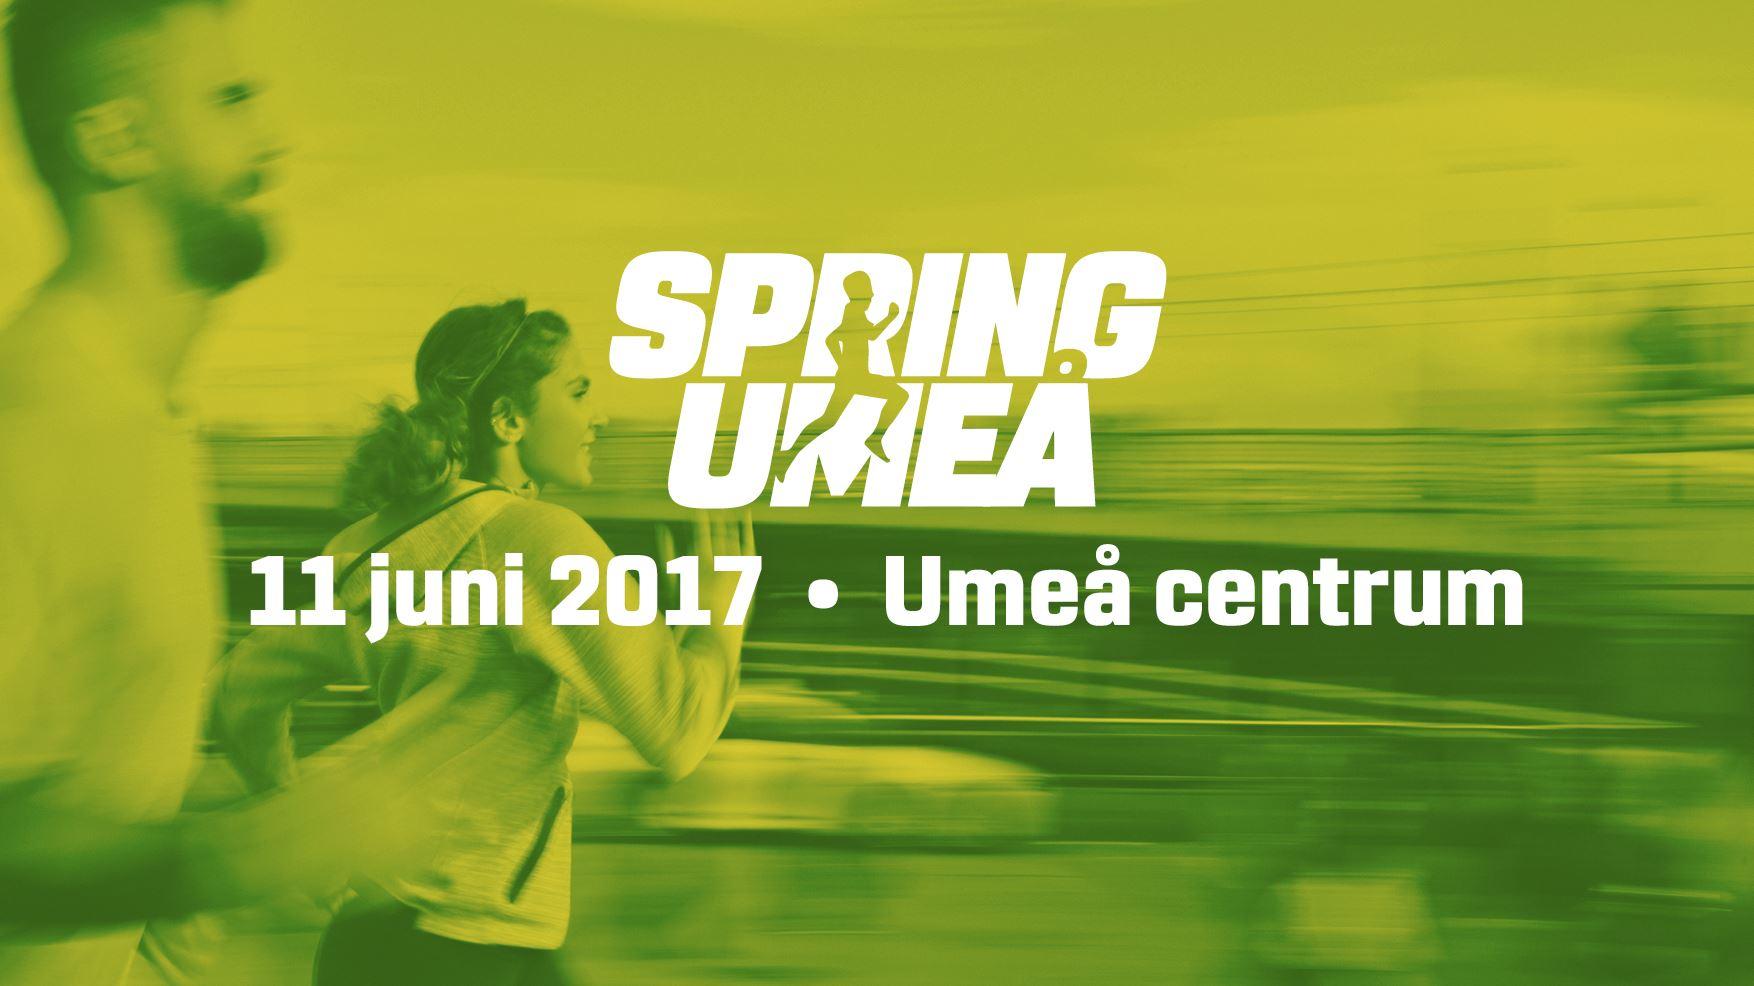 Spring Umeå 2017